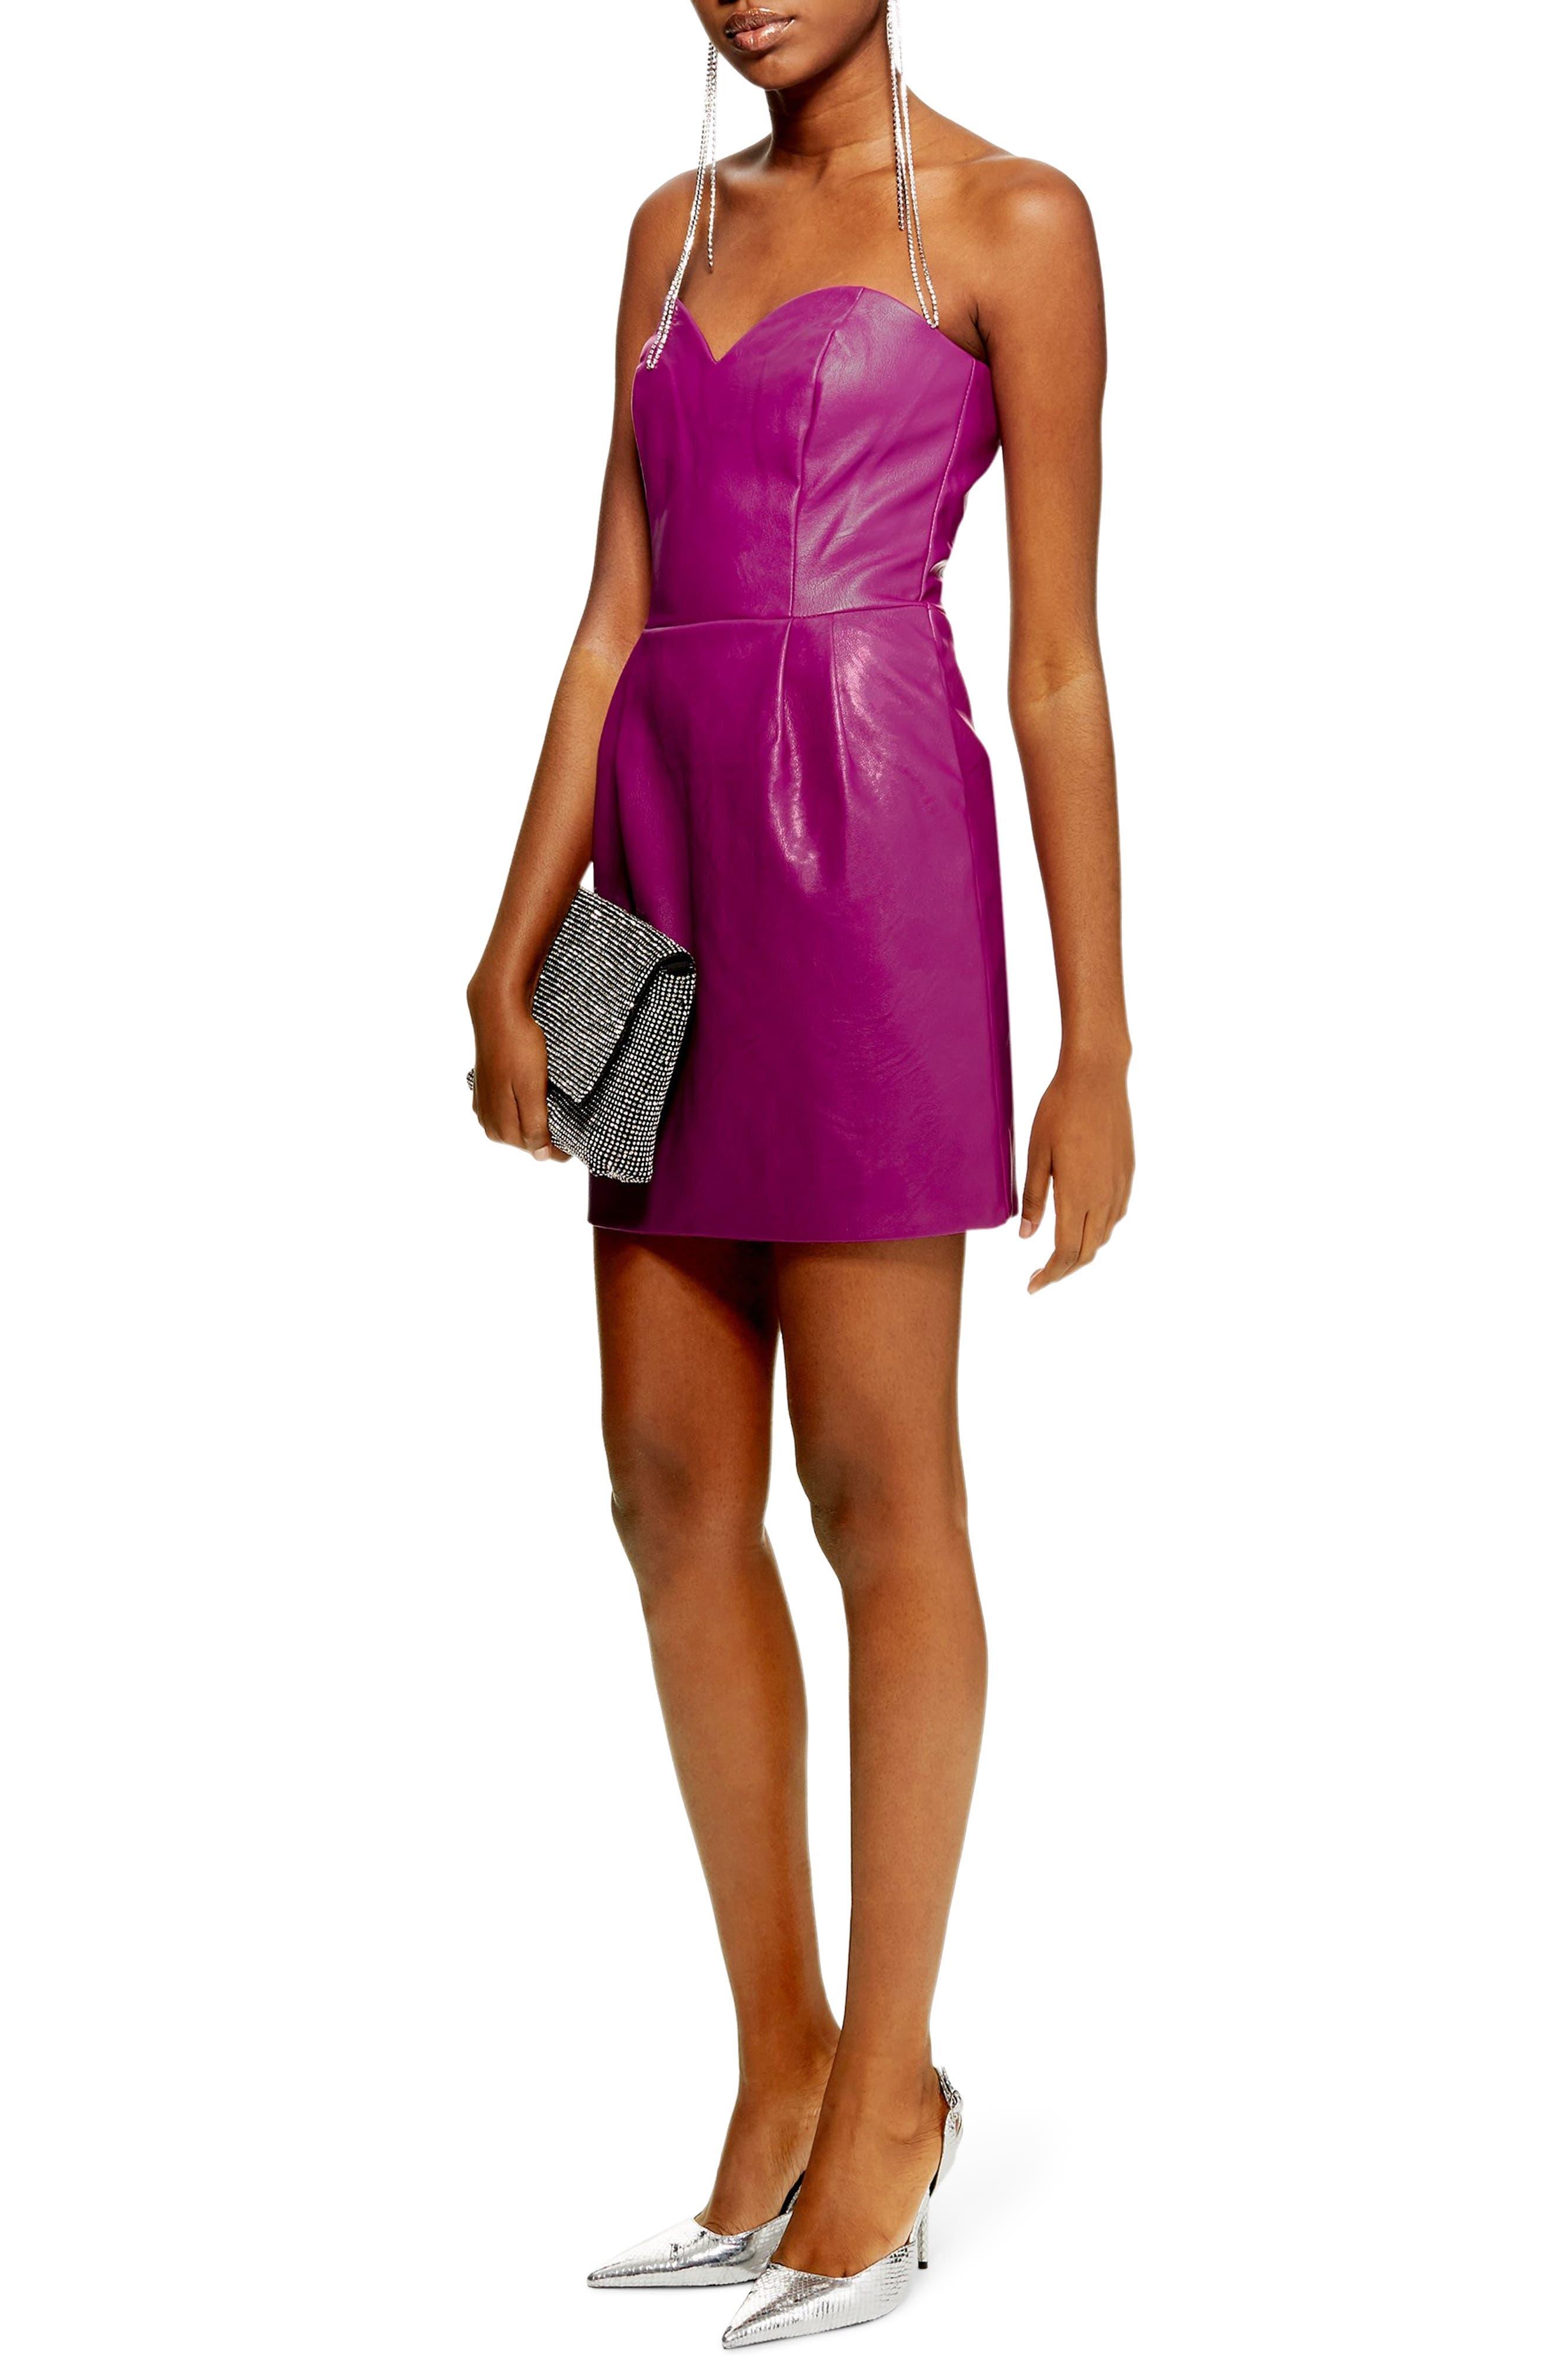 Topshop Faux Leather Bandeau Minidress, US (fits like 10-12) - Purple